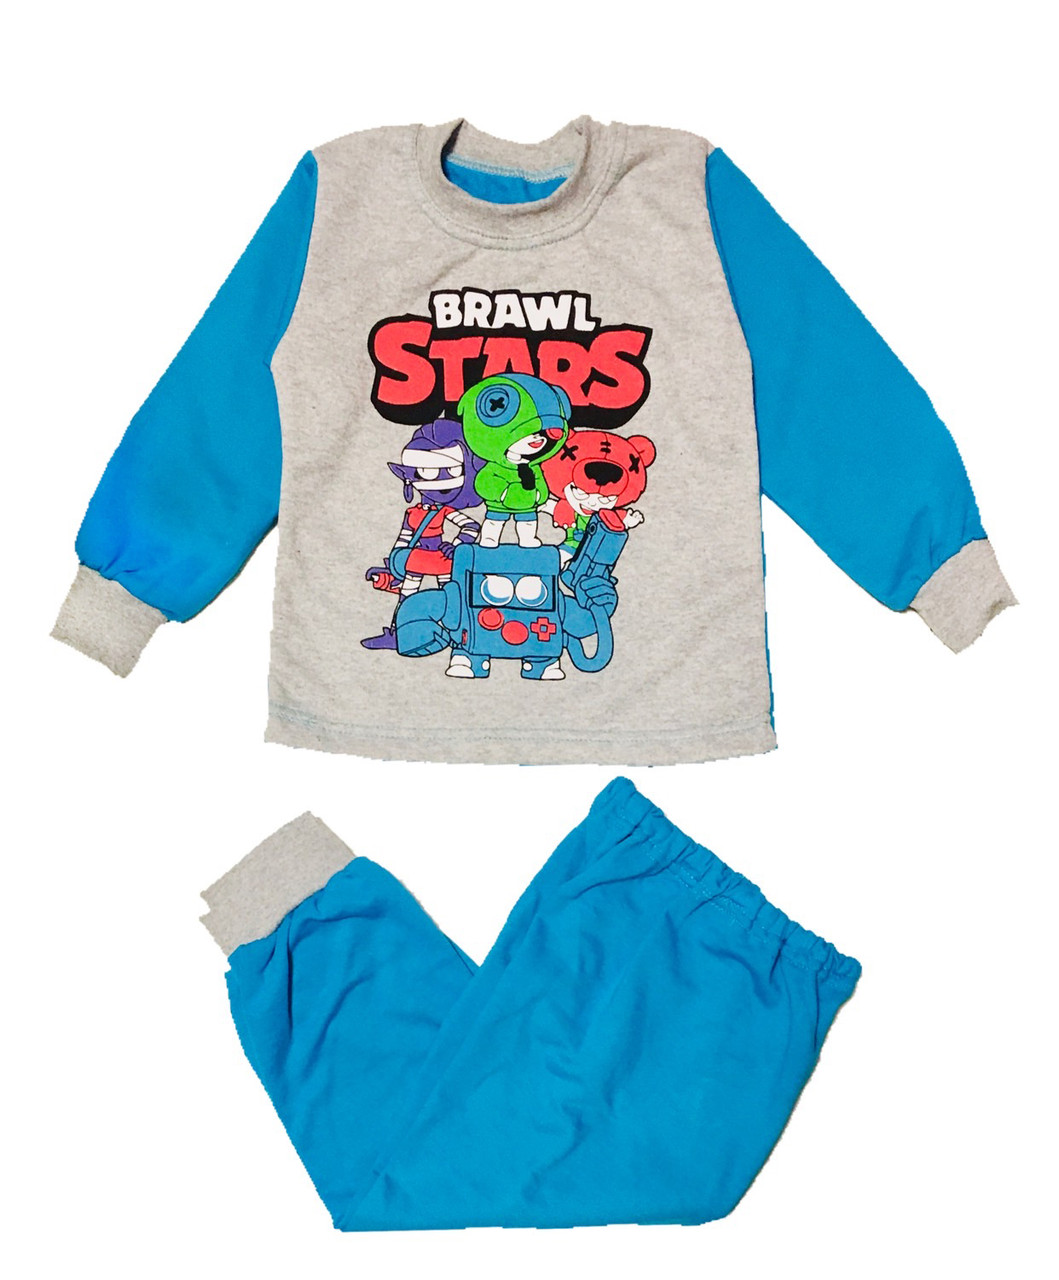 Тепла піжама дитяча для хлопчика Бравл Старс, 104см